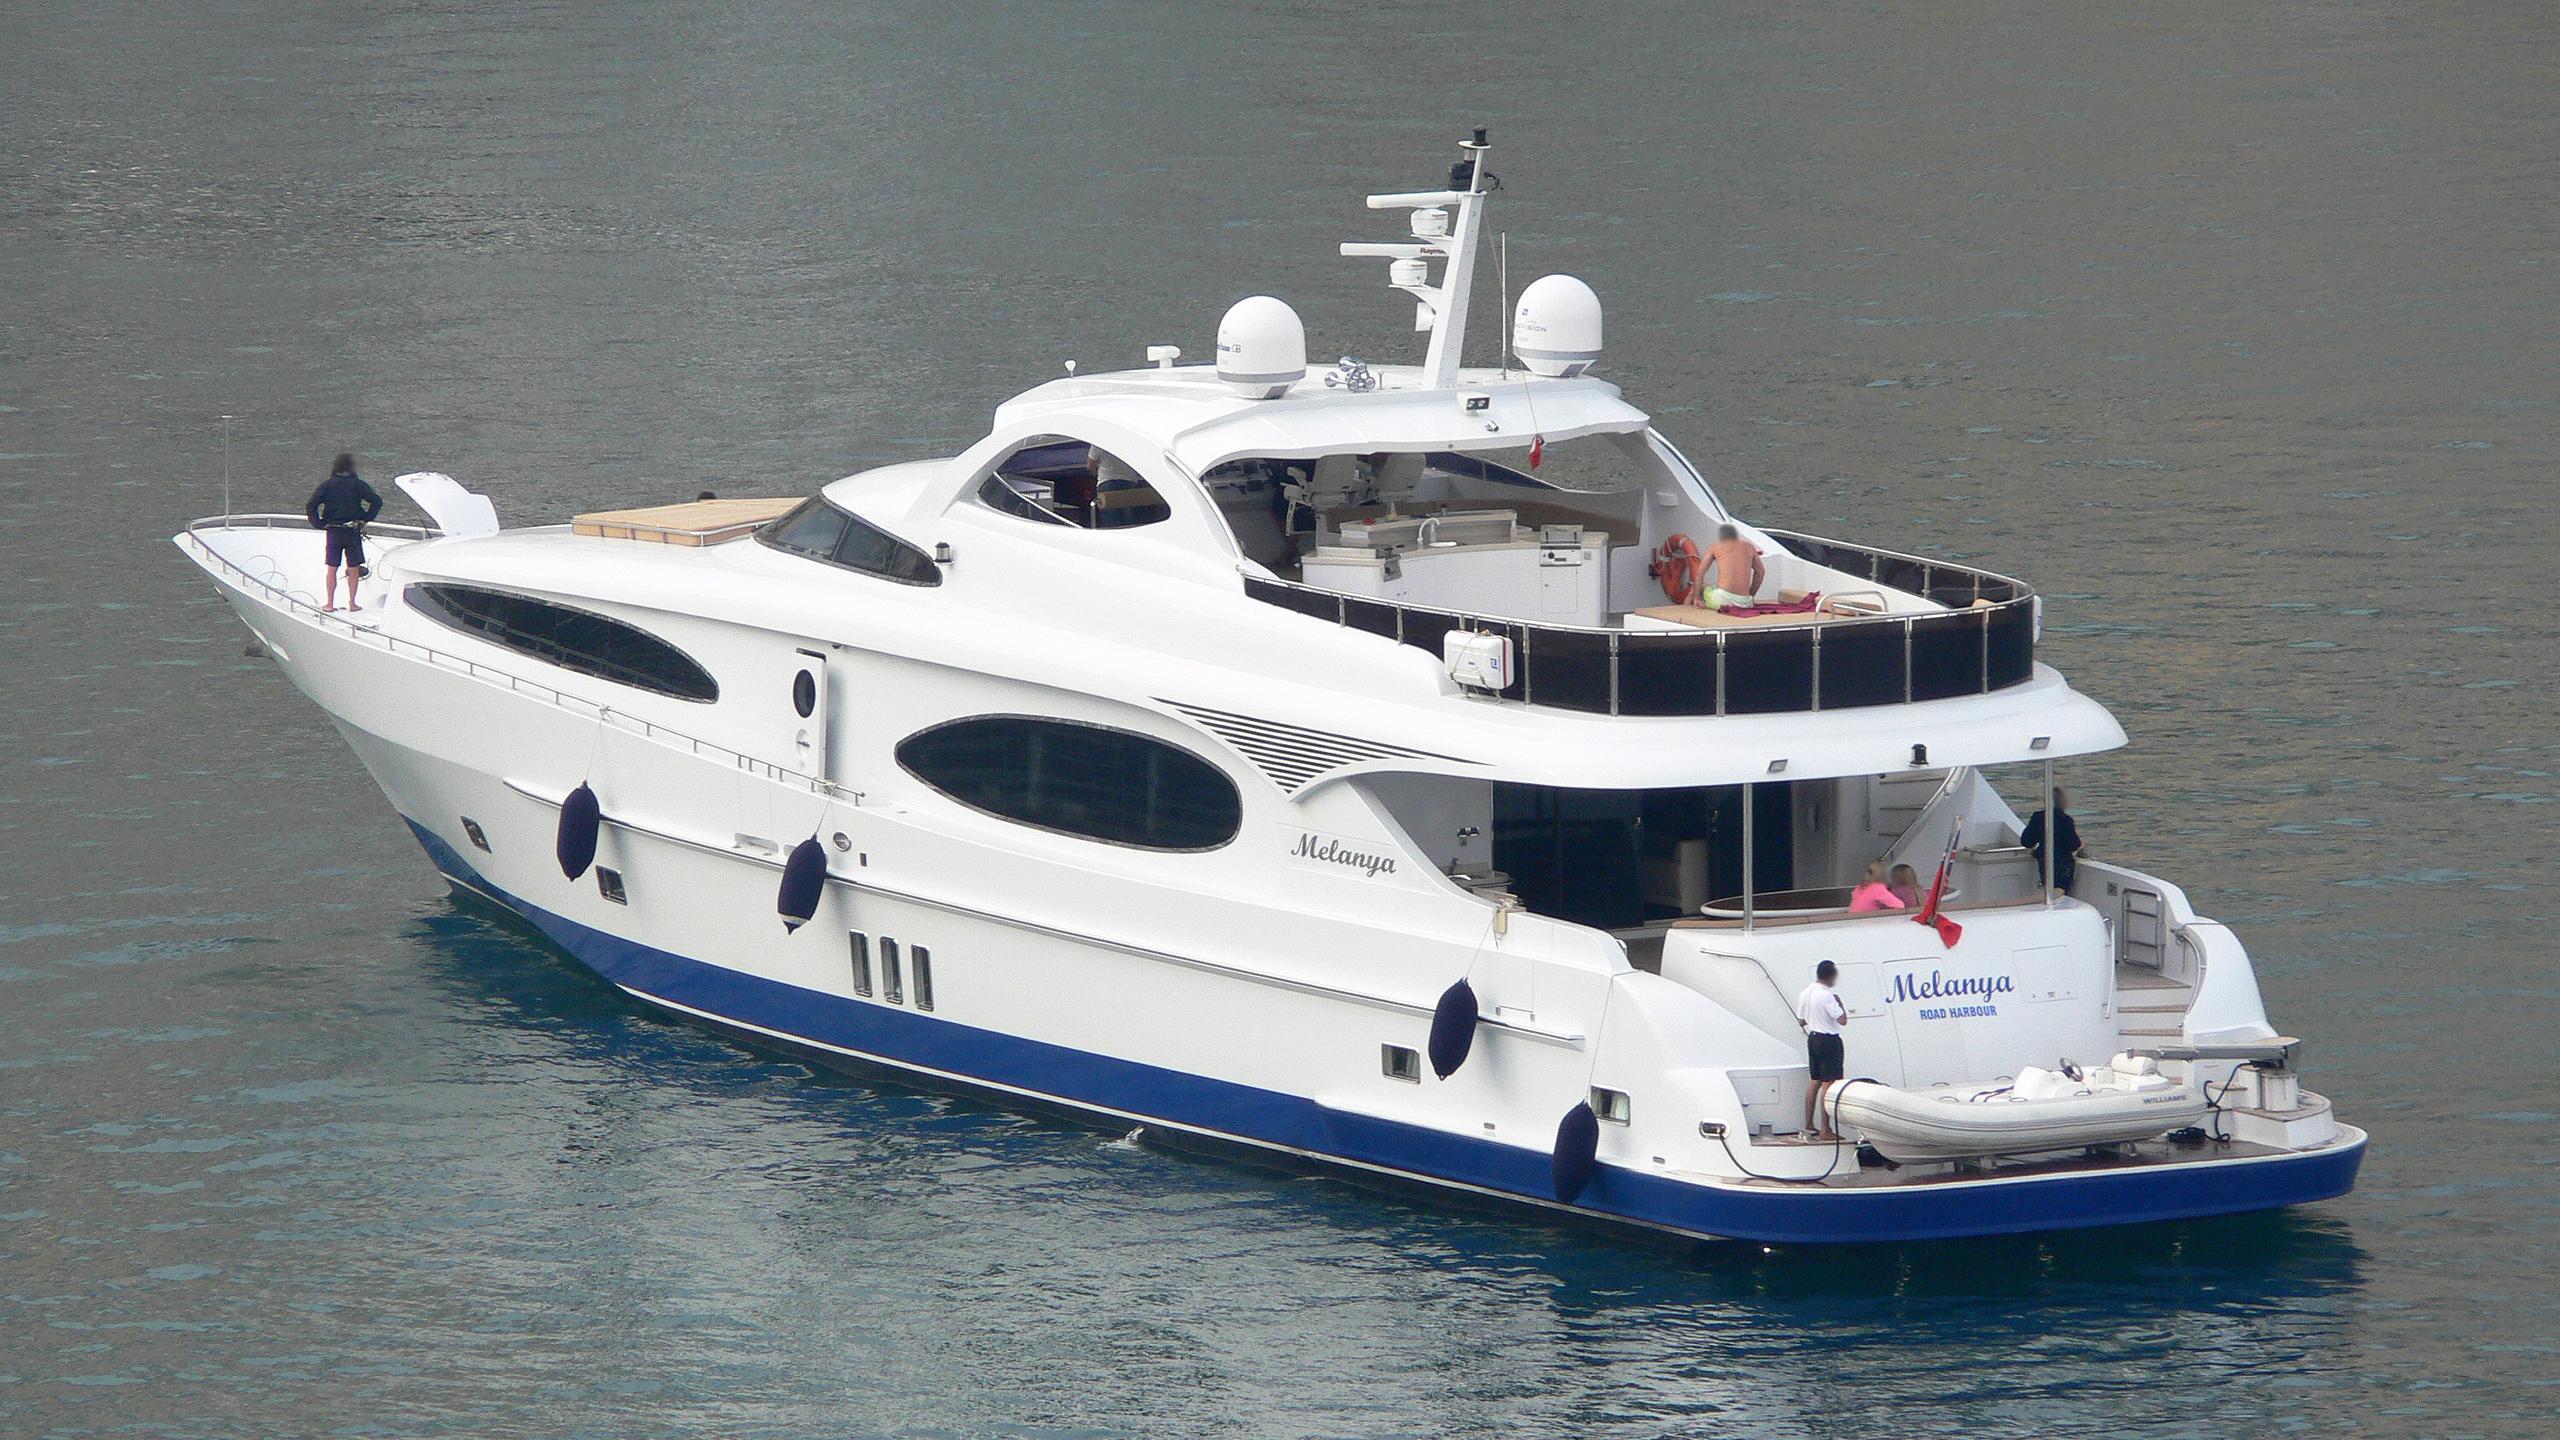 melanya-motor-yacht-gulf-craft-majesty-118-2006-36m-stern